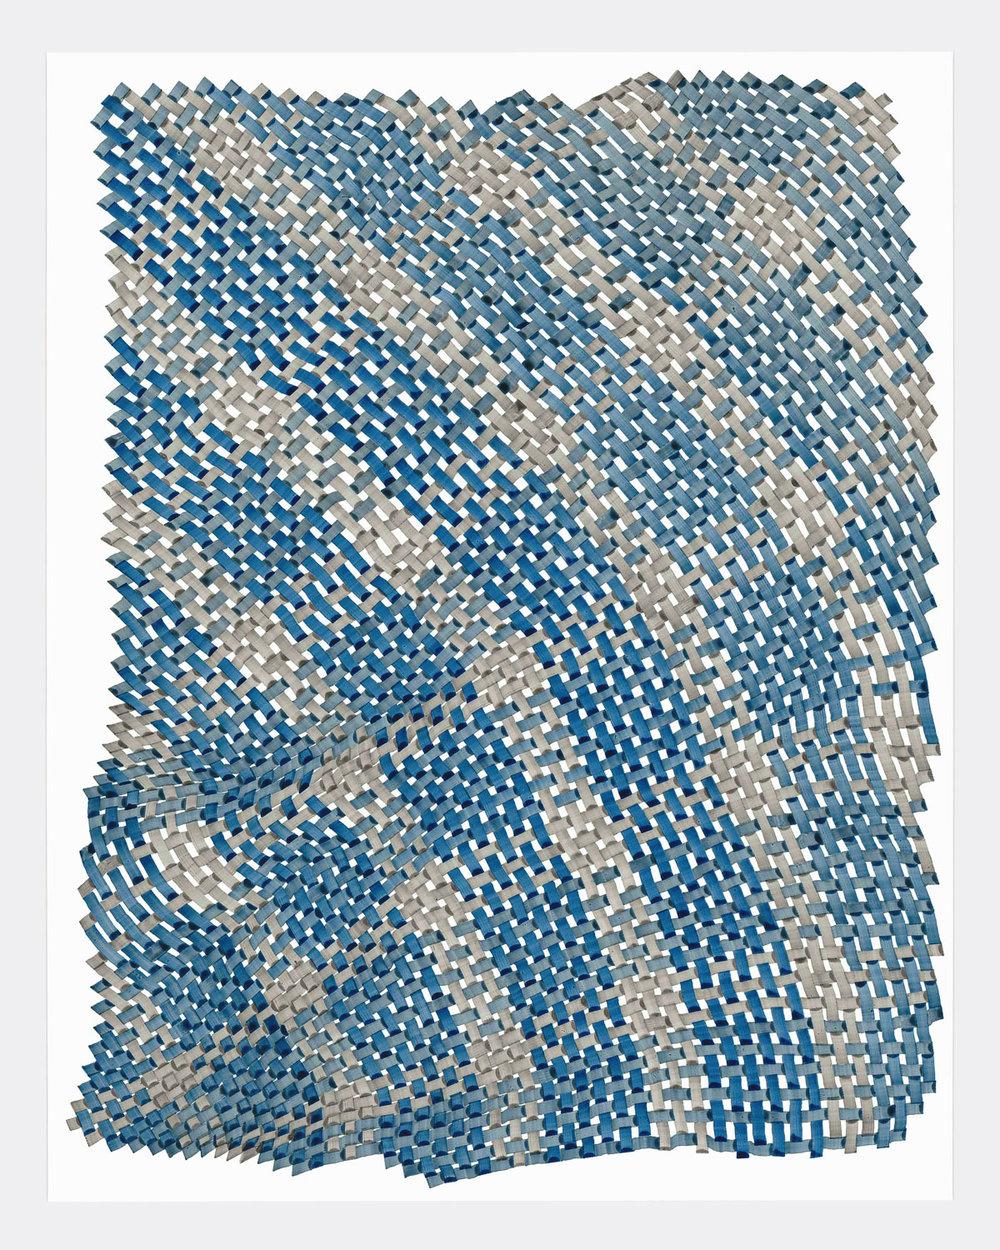 Woven Lines 7 ,  2019   acrylic on yupo medium 14 x 11 in (35.56 x 27.9 cm)